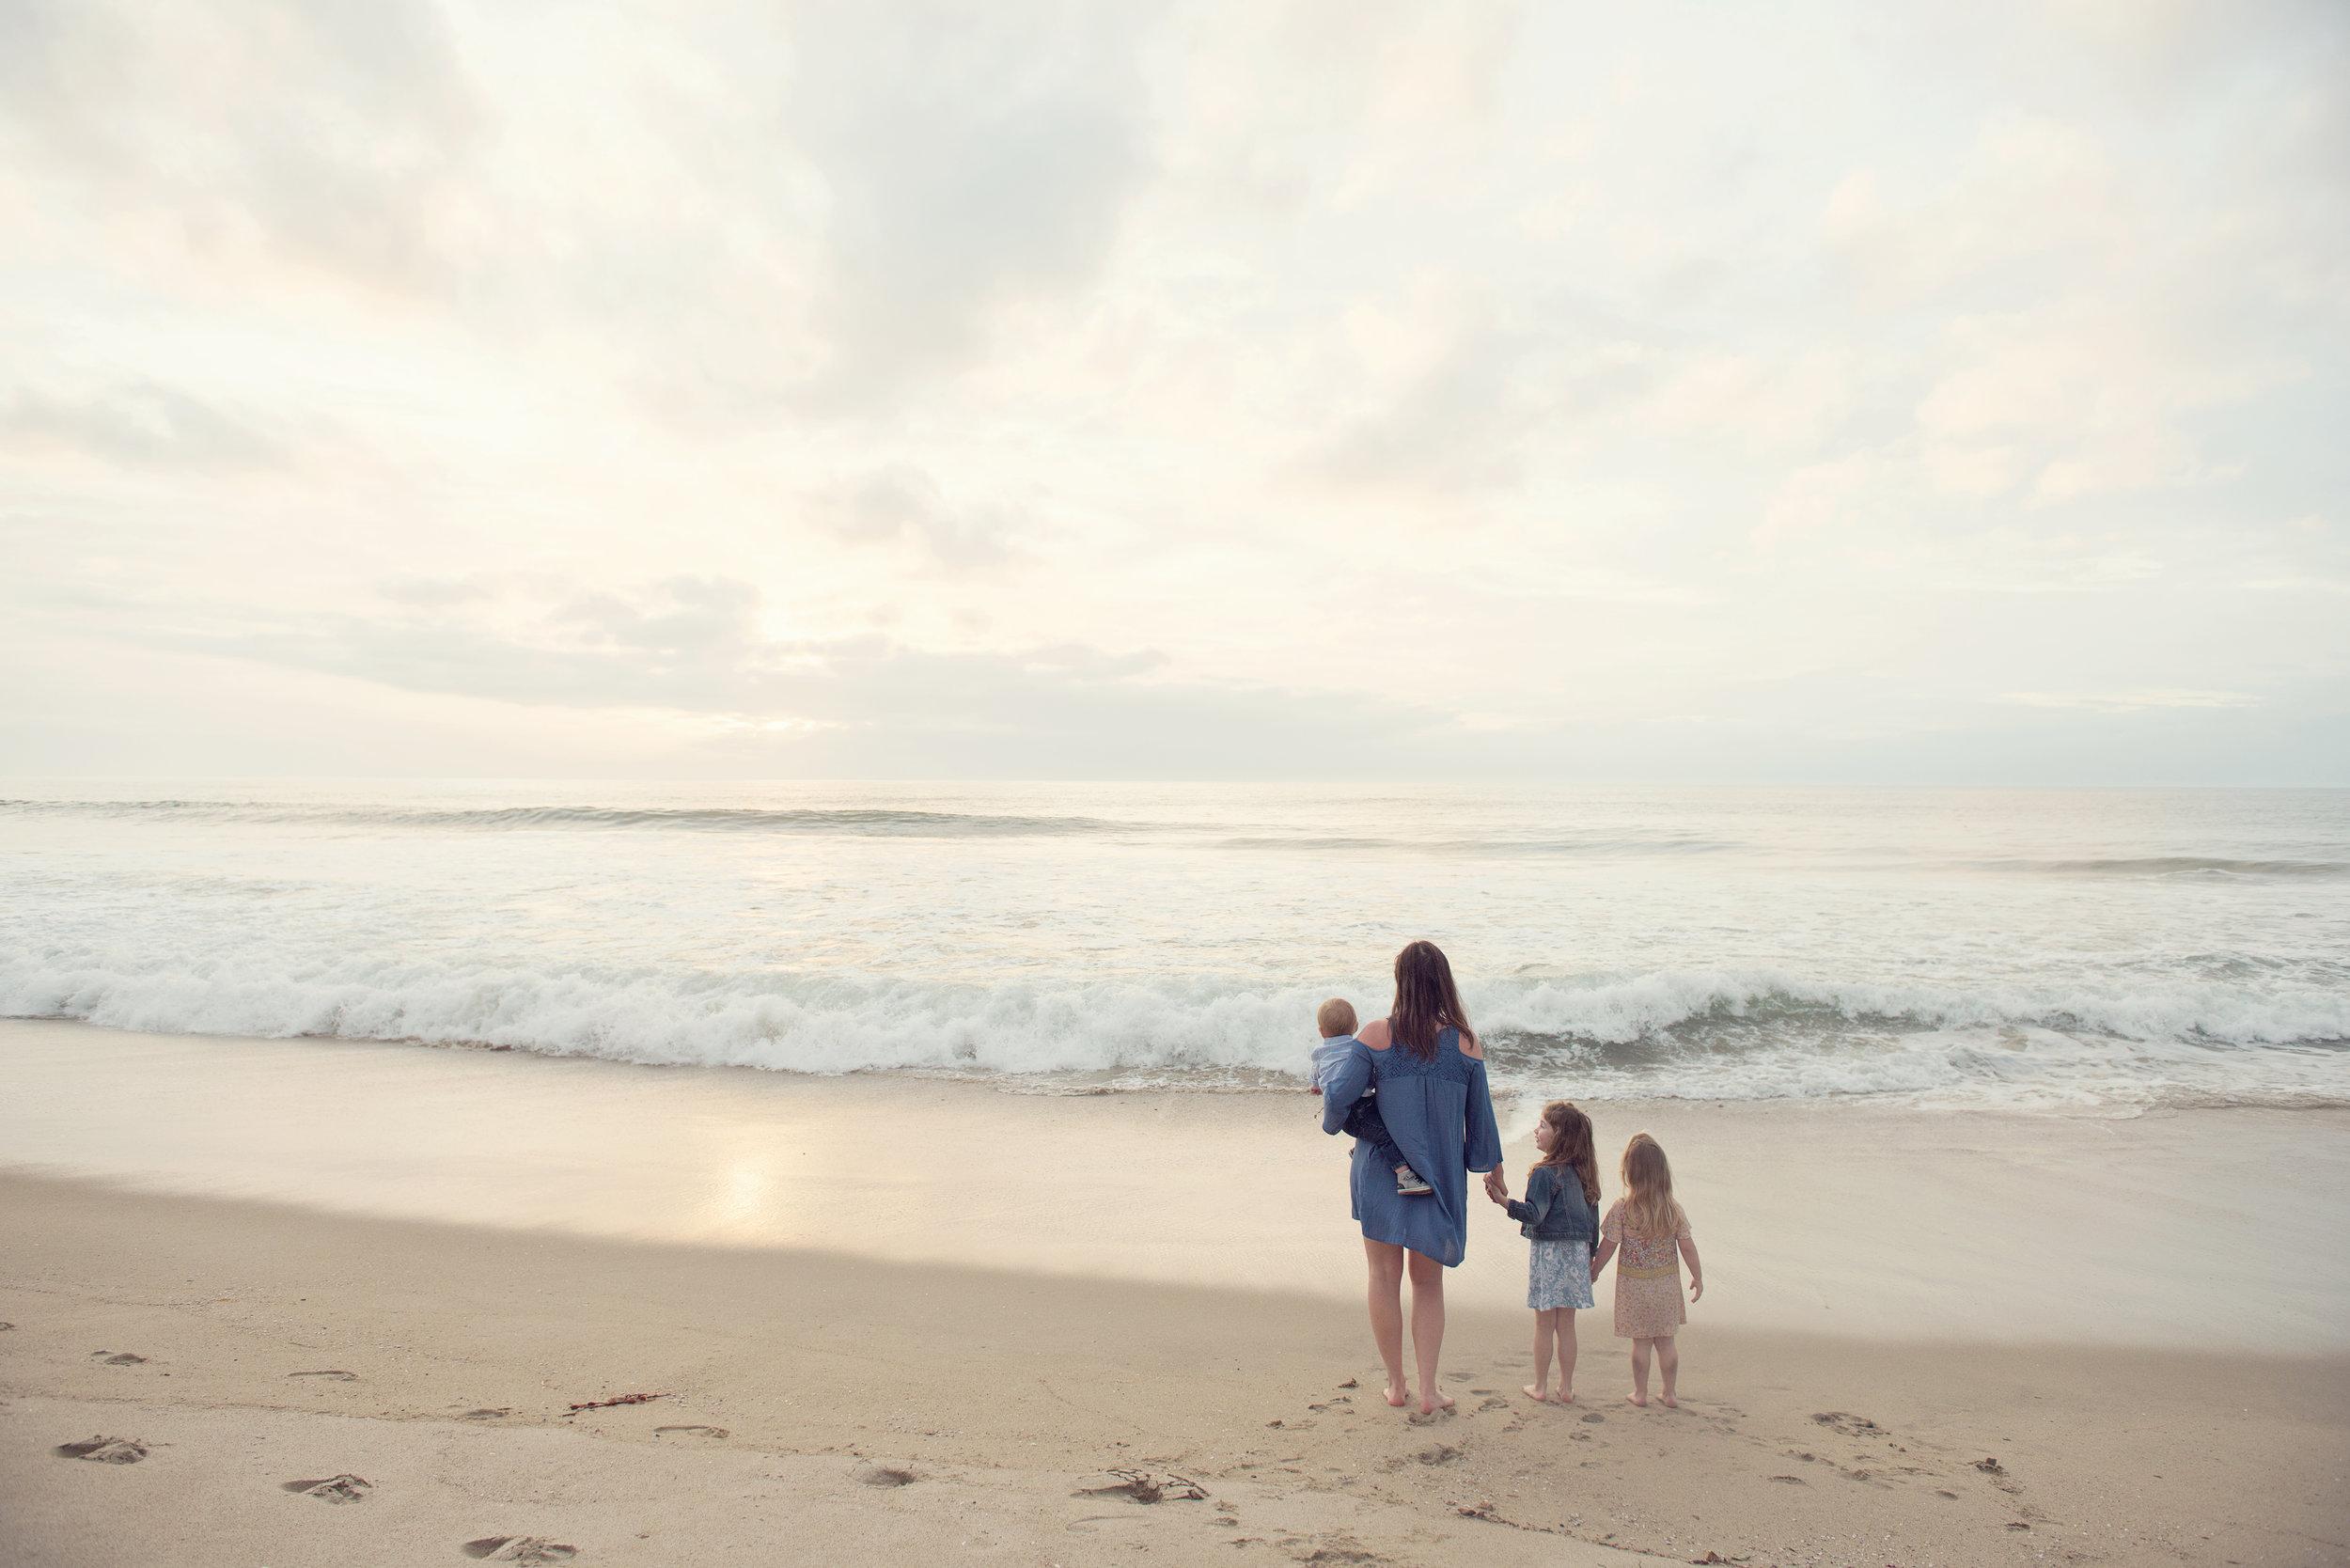 sample_beach-3.jpg